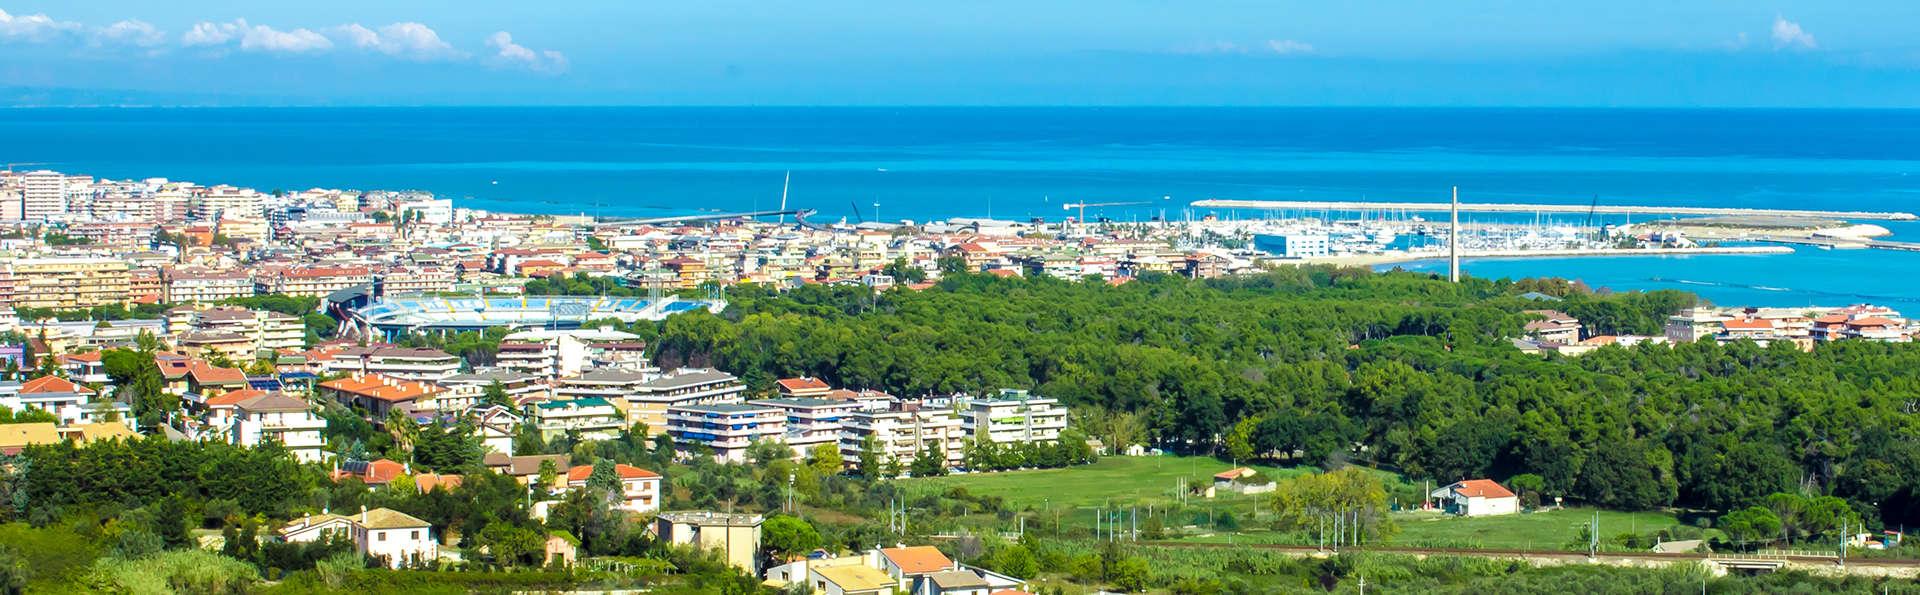 Villa Immacolata Parc Hotel Pescara